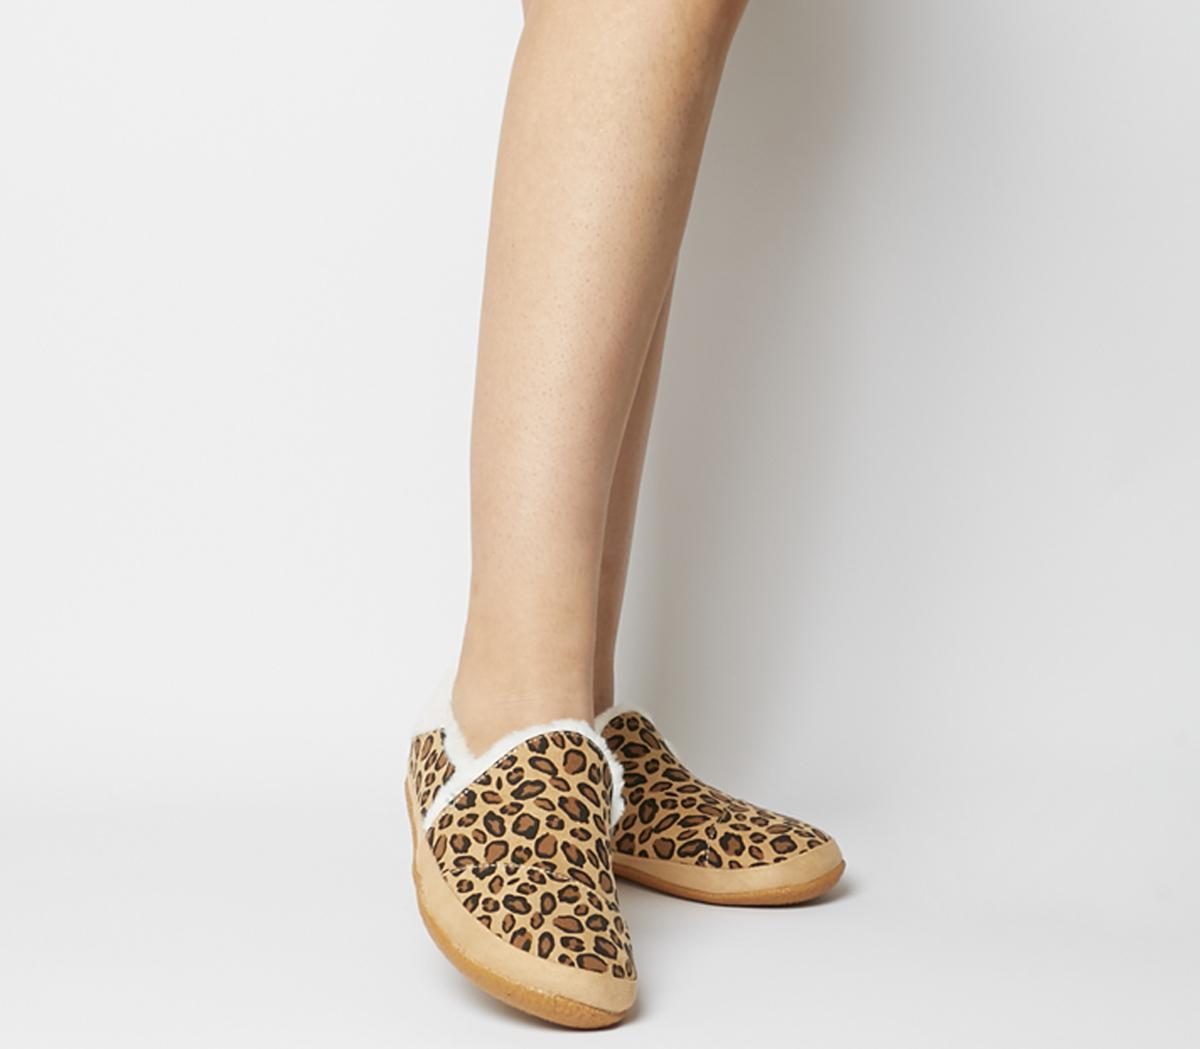 Toms India Slippers Desert Tan Leopard